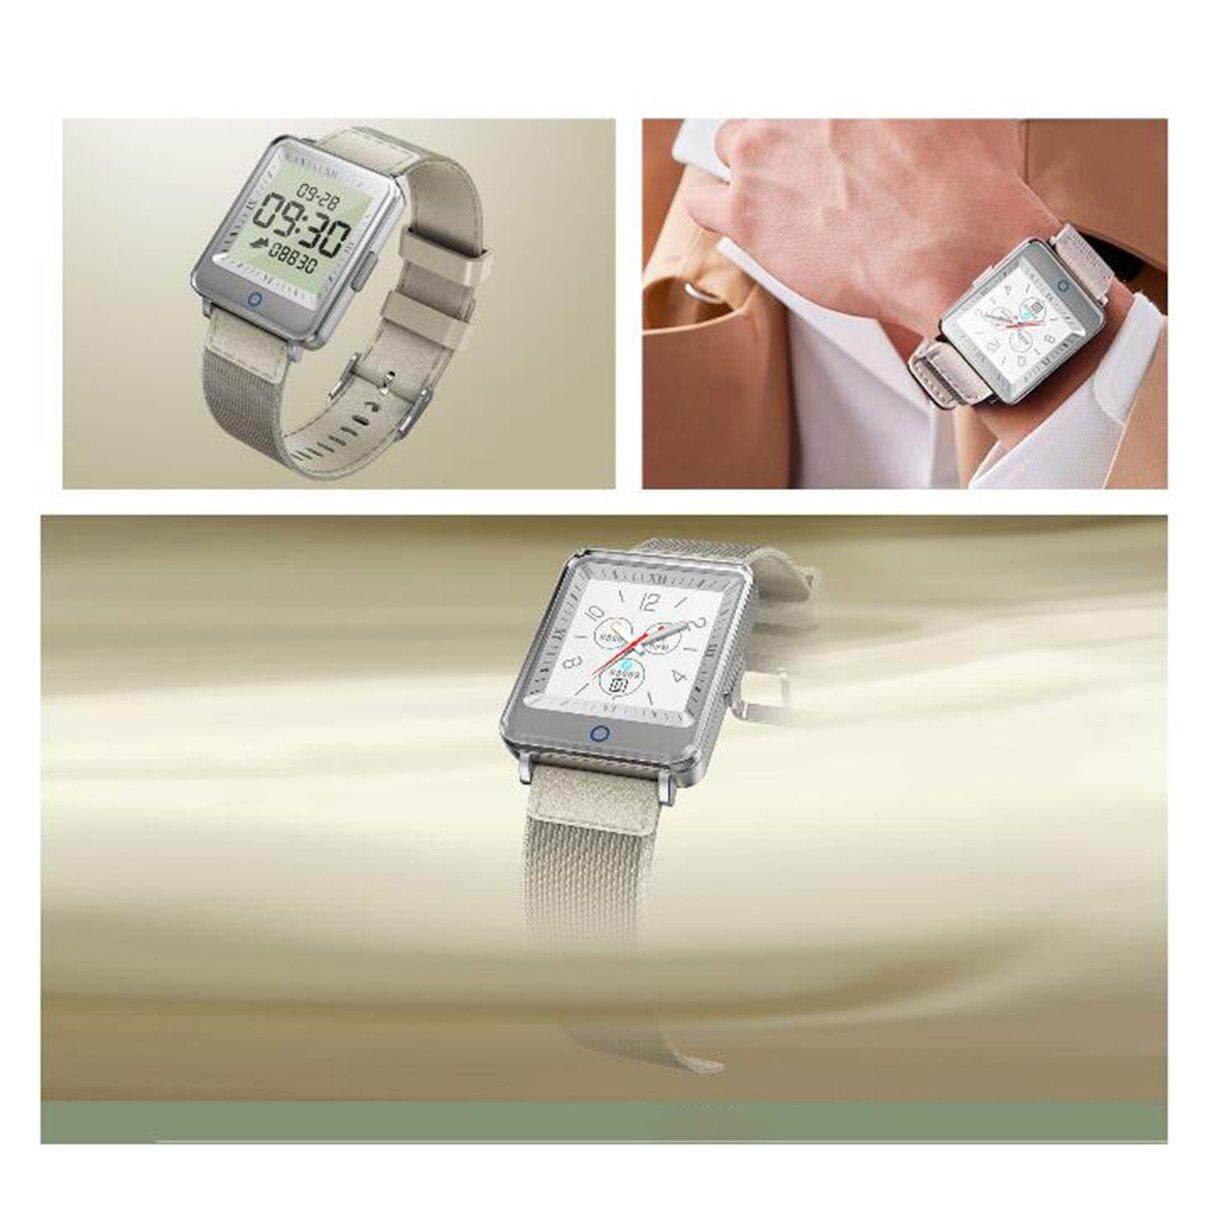 Crazy Deal Business Style Designed For Business People V16 Dual-screen Smart Bracelet